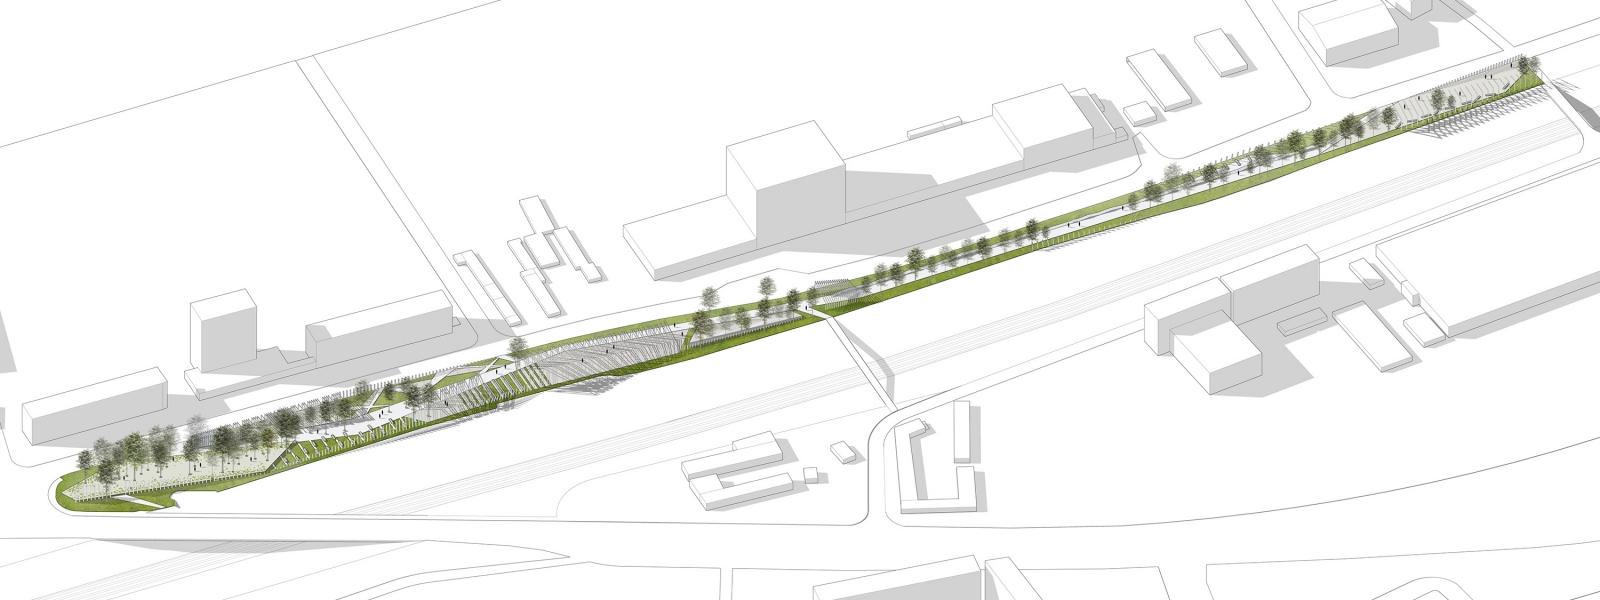 work-Проект благоустройства Электролитного бульвара